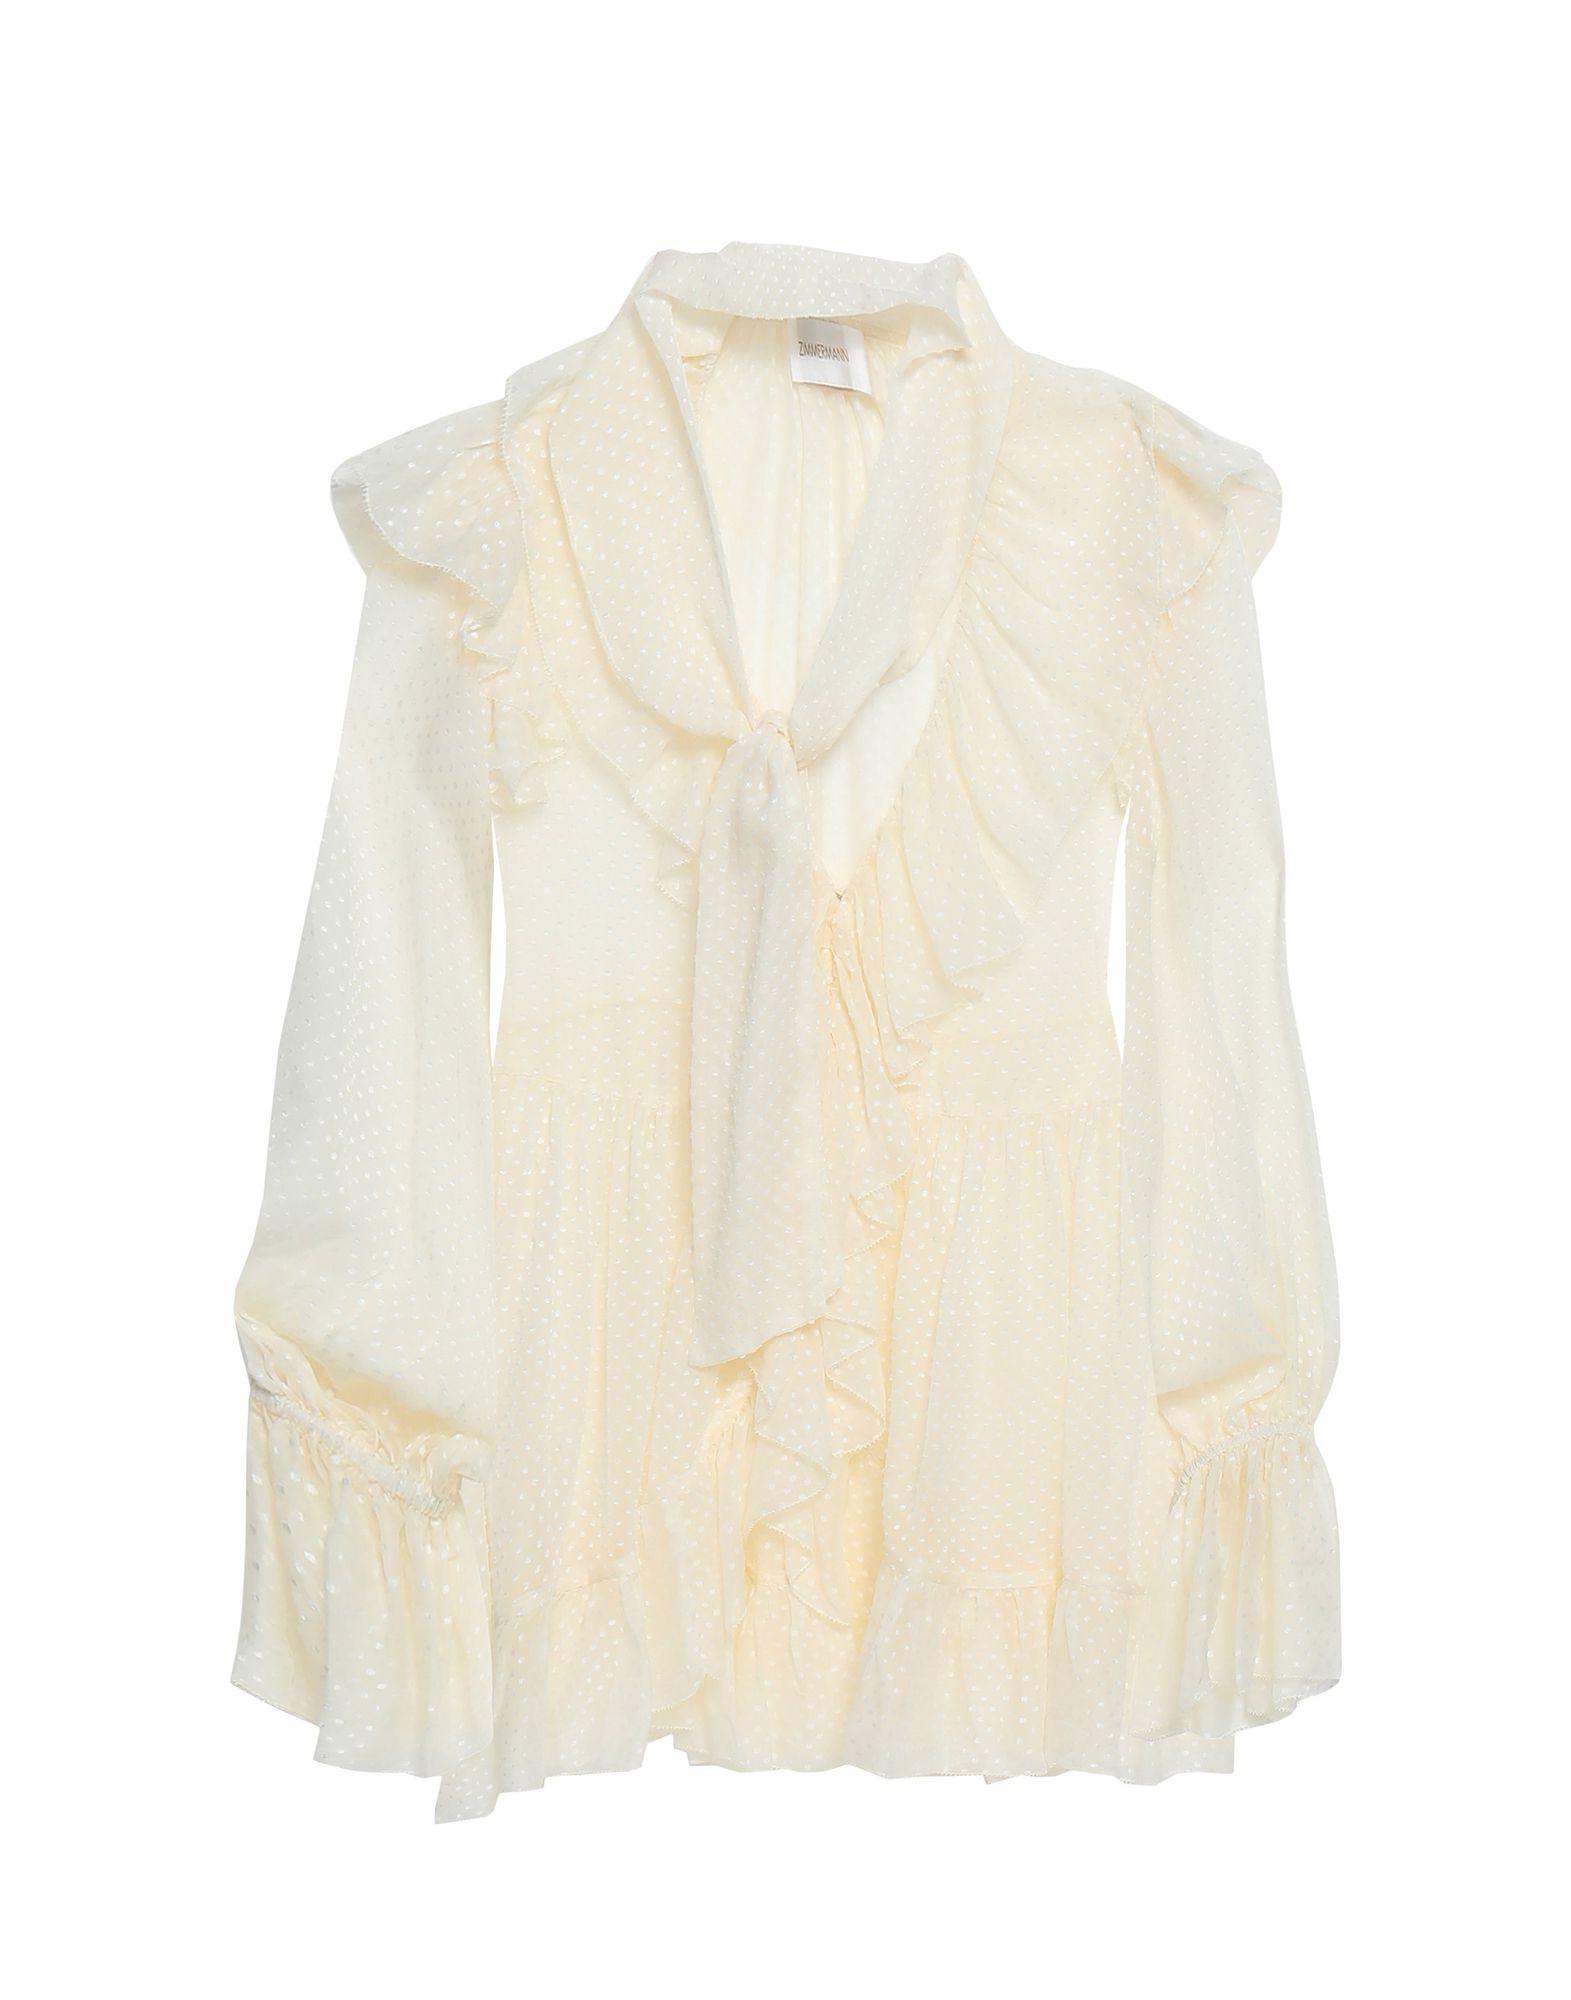 ZIMMERMANN Shirts. crepe, no appliqués, solid color, front closure, button closing, long sleeves, v-neck, no pockets. 65% Silk, 35% Viscose